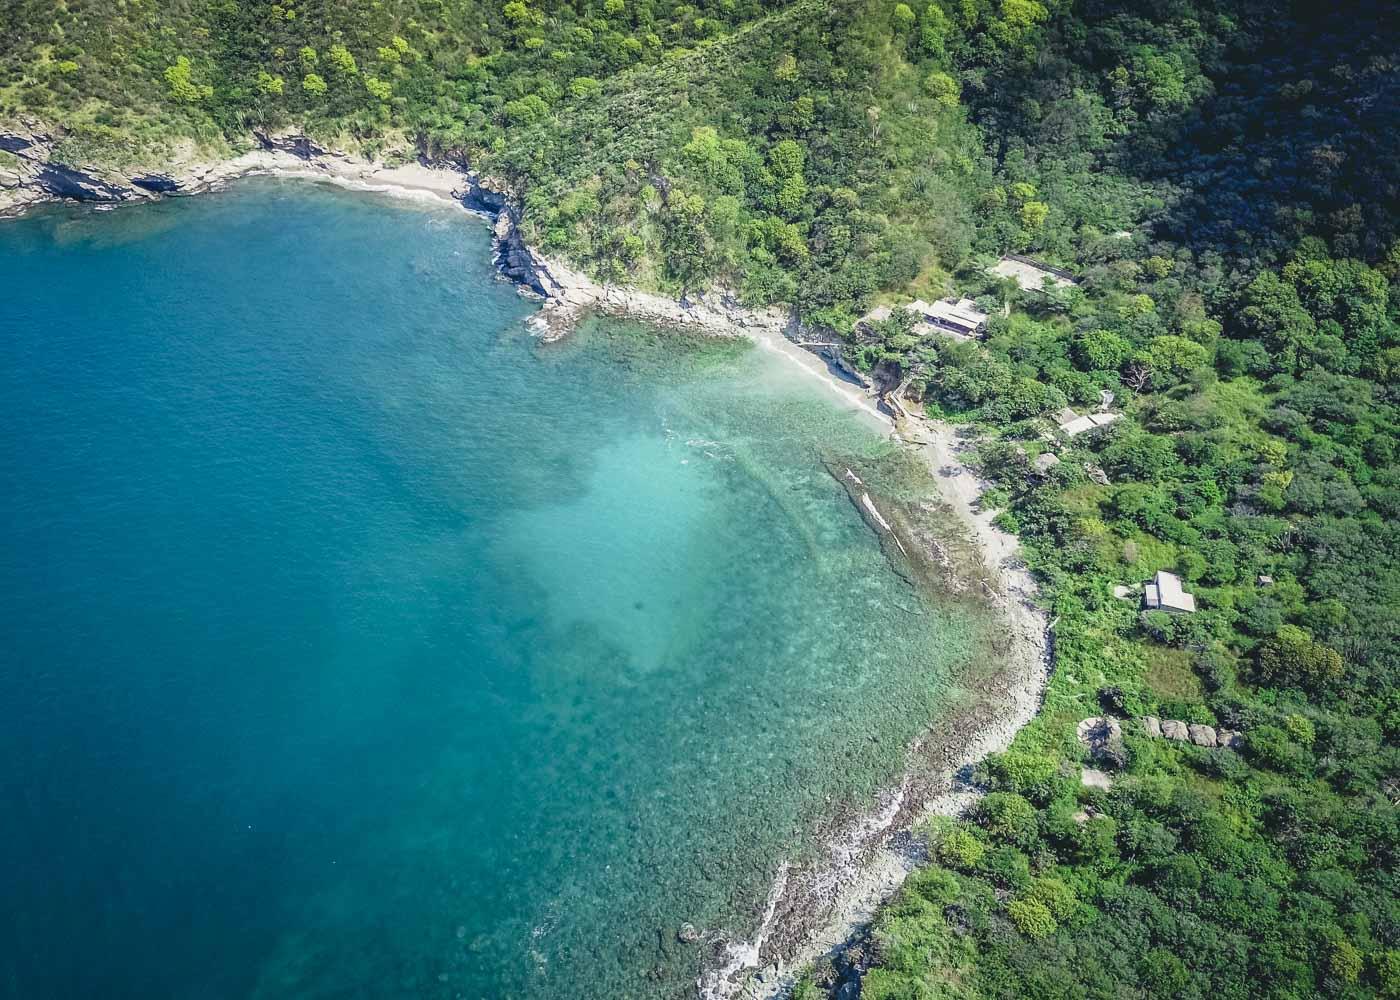 Bahia Concha, Tayrona National Park, Santa Marta